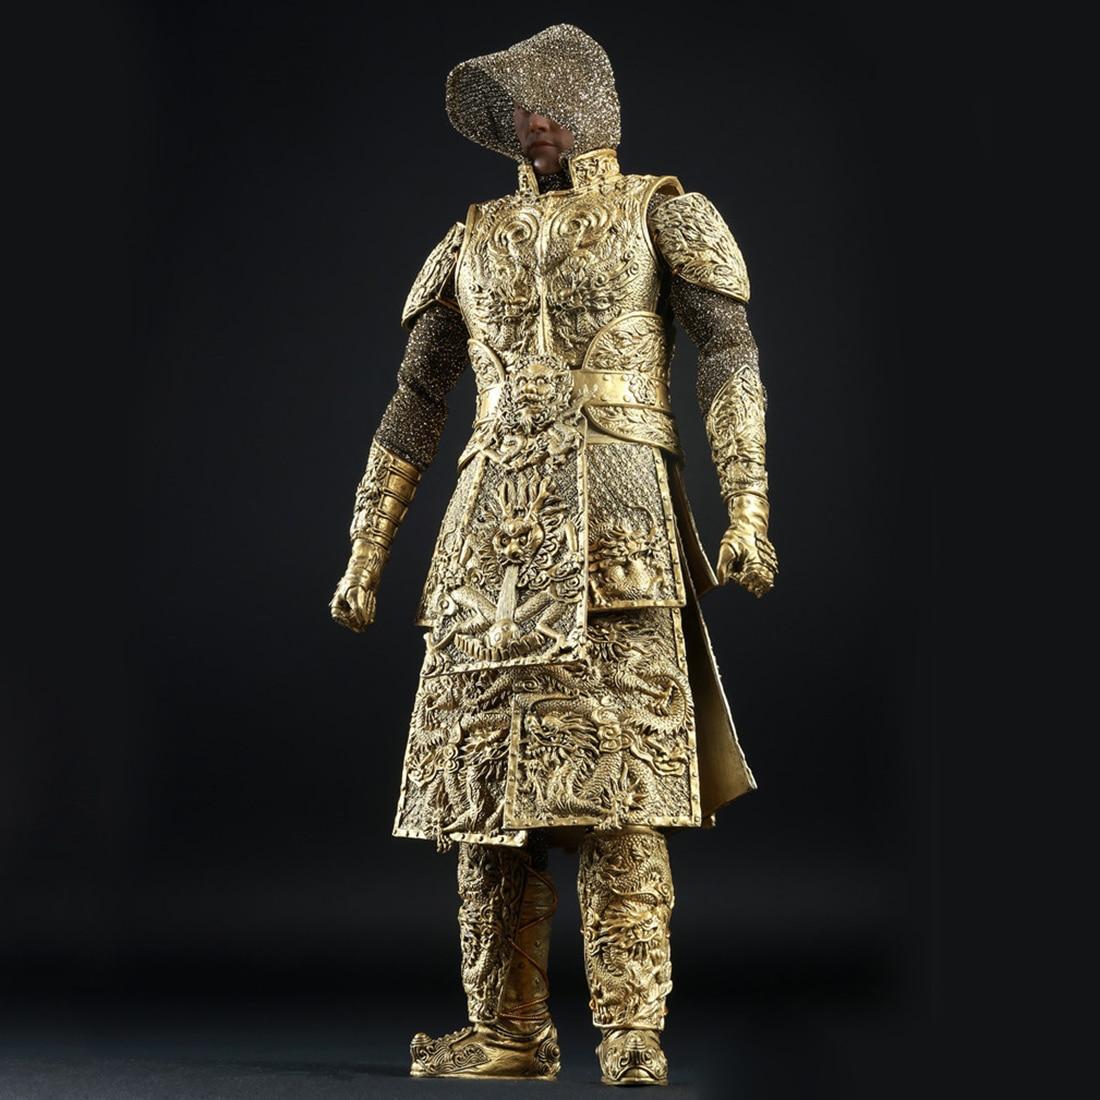 1:6 древний дракон шаблон Armour Barde одежда для 12 Мужской солдат Модель Фигурки Игрушка аксессуар серебро - 3